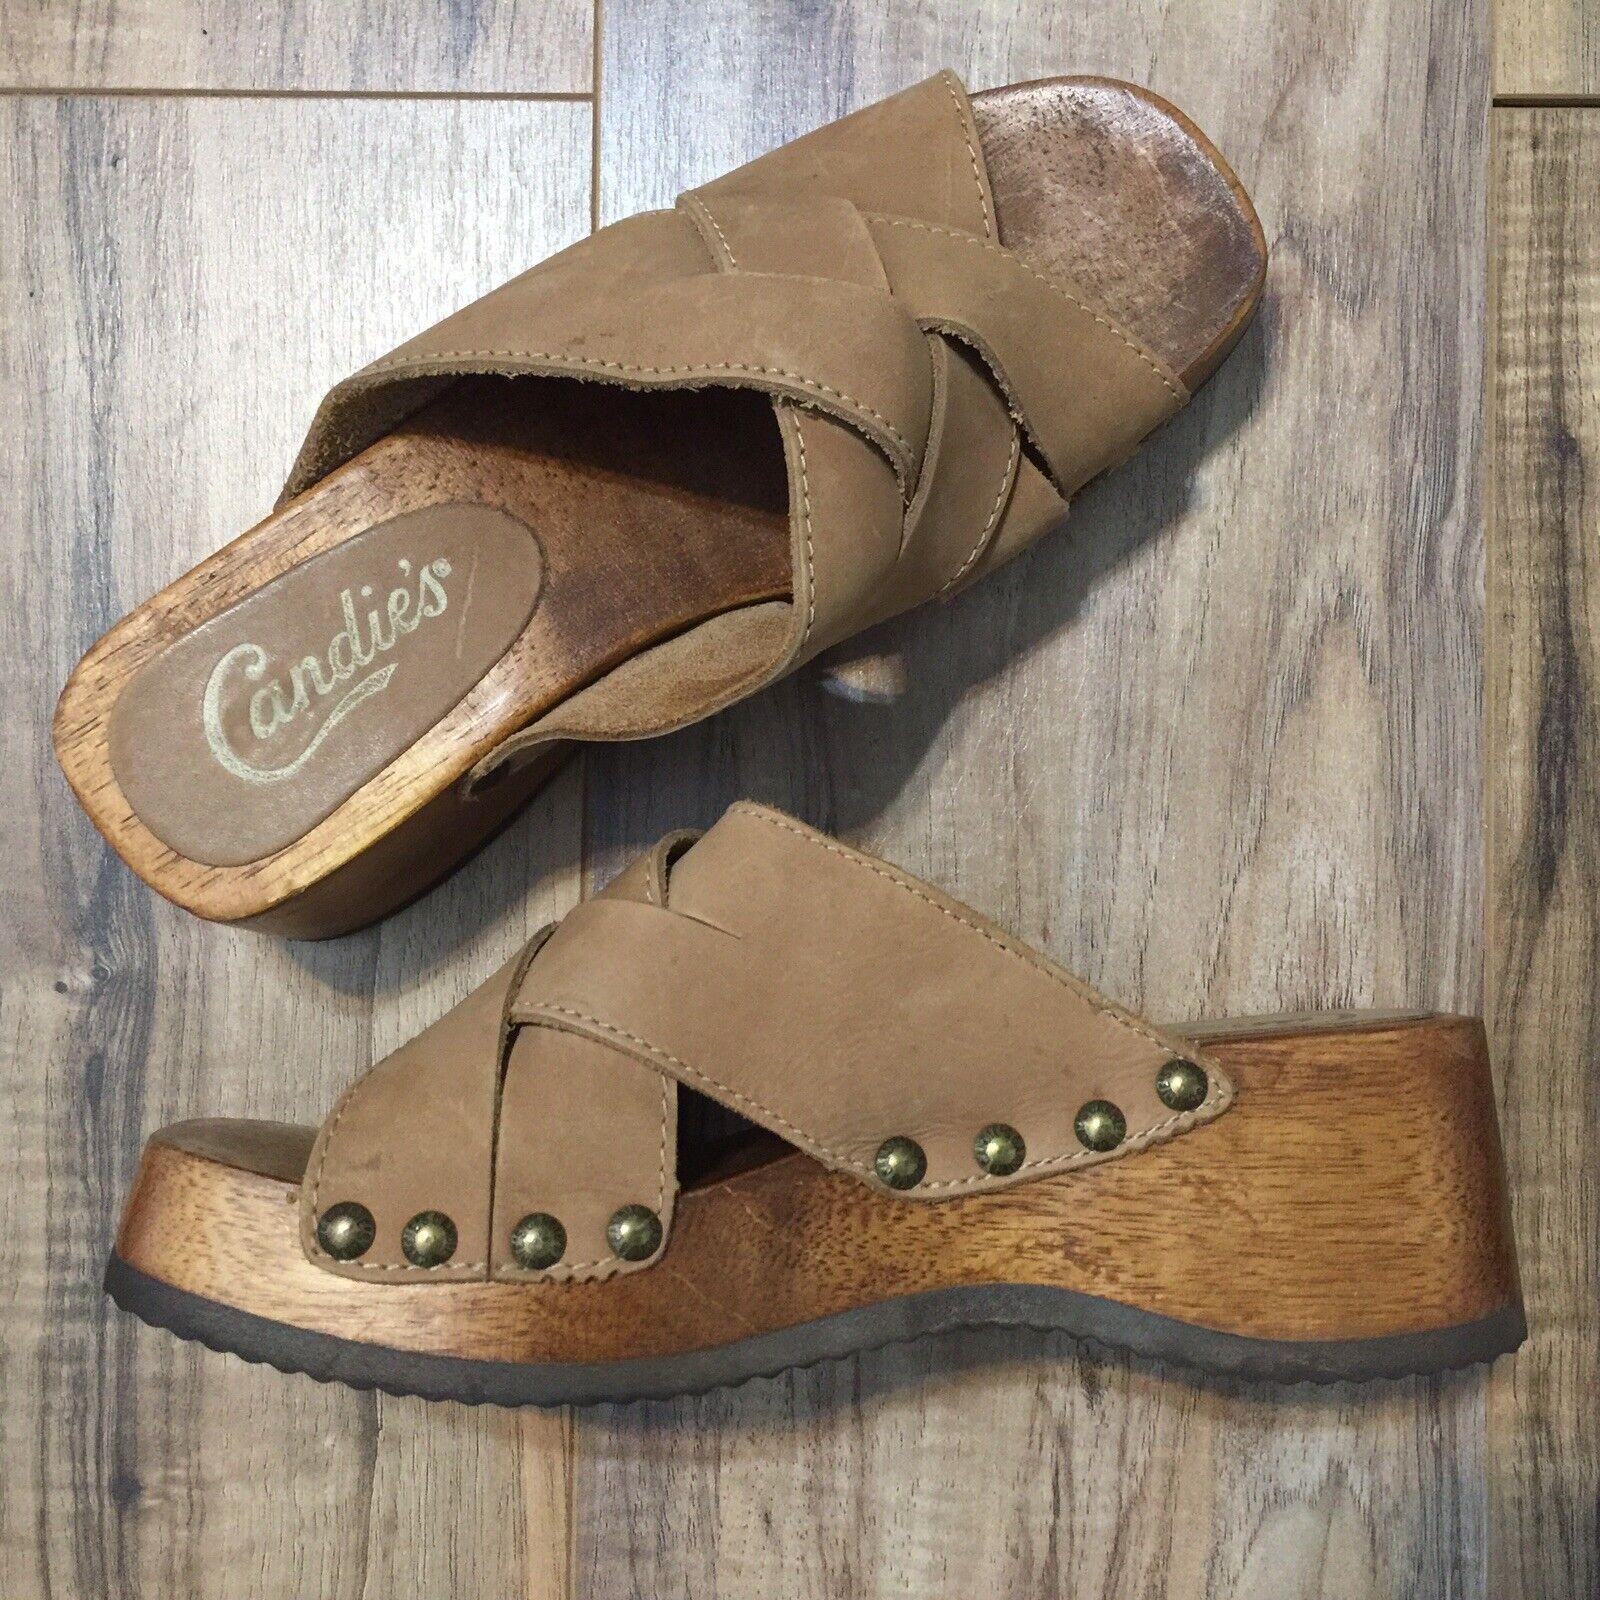 Vintage 90s Candies Wedge Sandals Slides Clogs Light Brown 7.5 - Boho Hippie